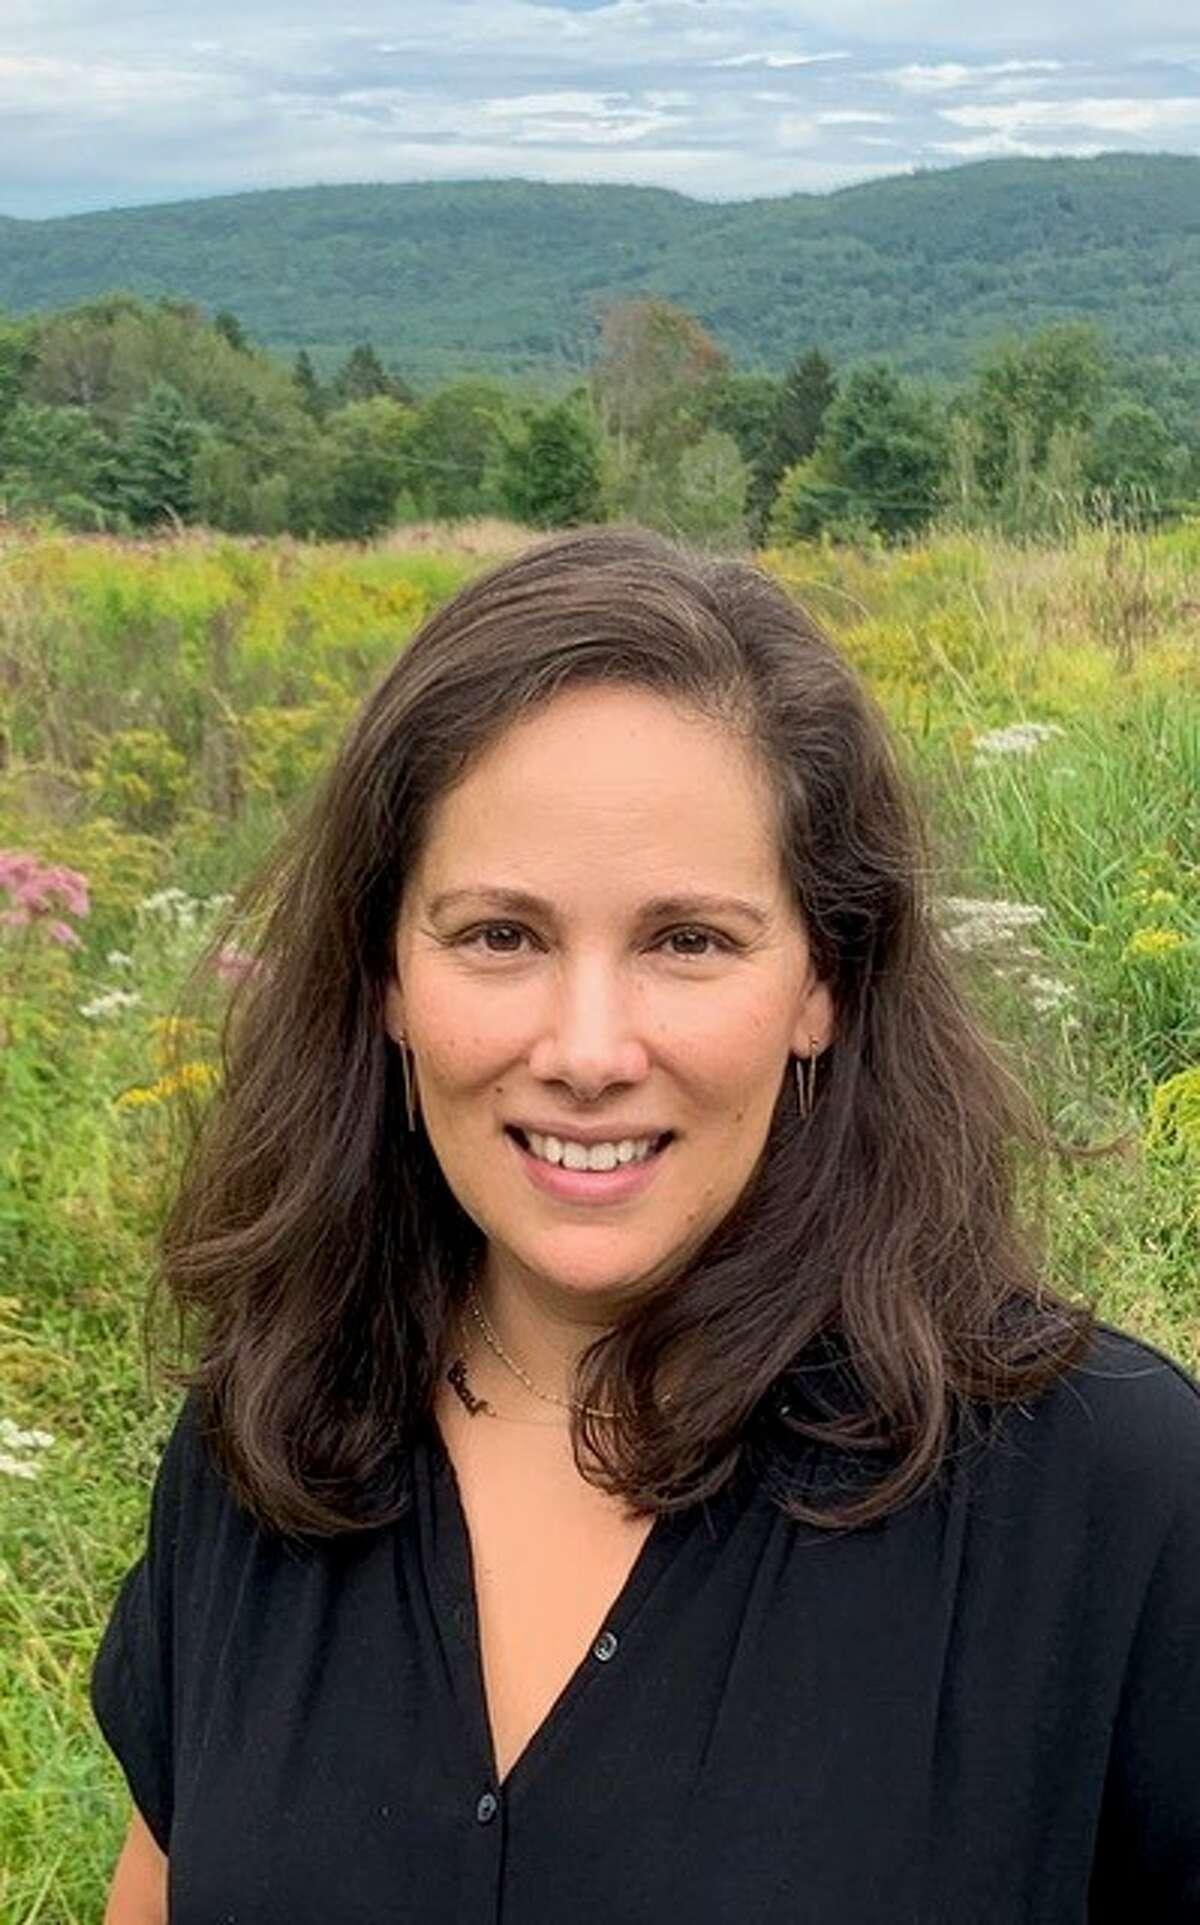 Real estate agent Jennifer Sesma